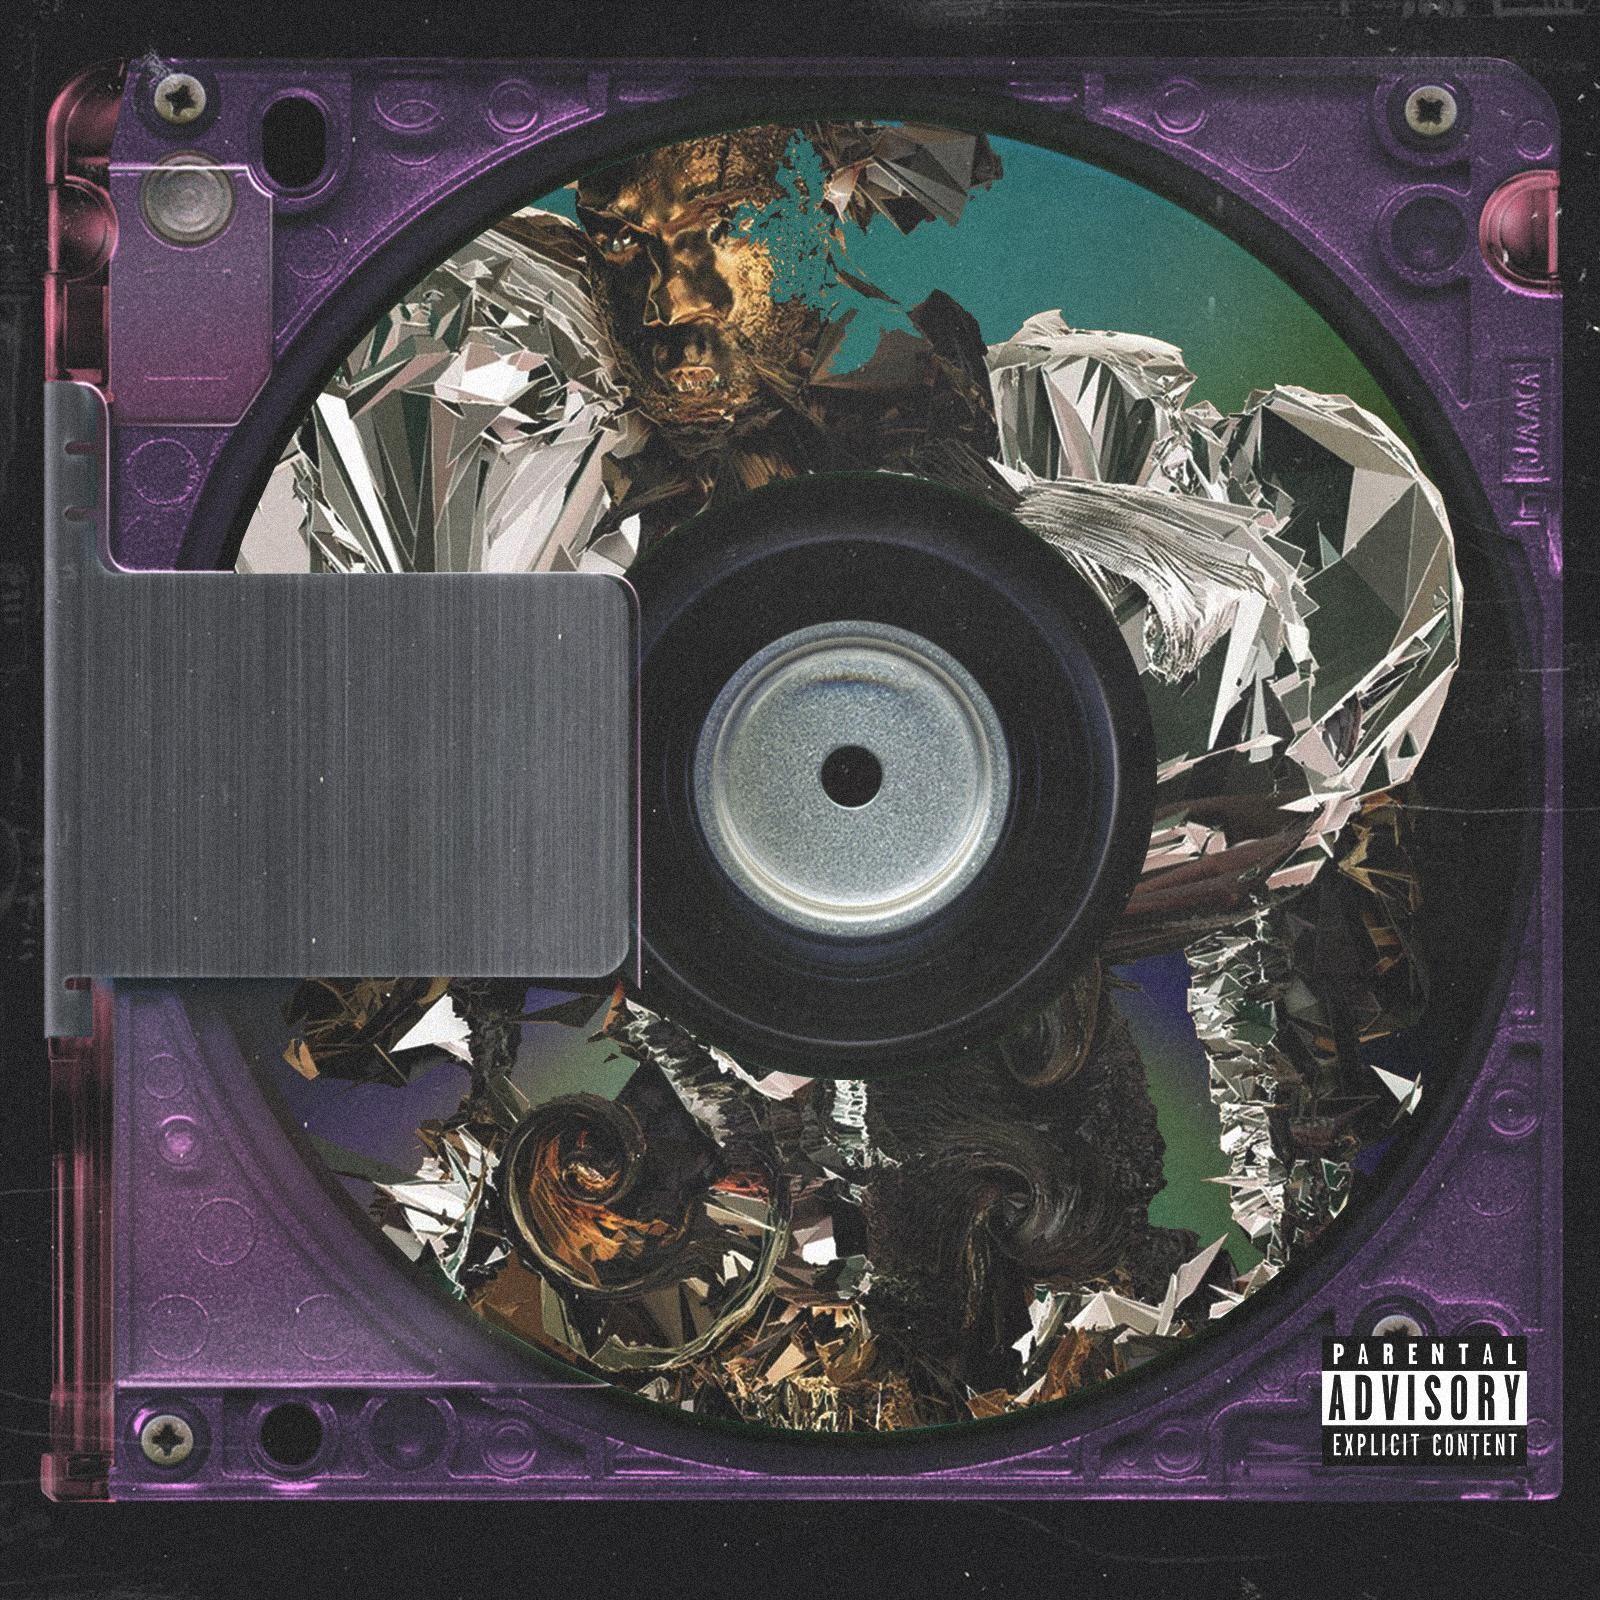 R Kanye Dedicated To Kanye West Album Art Design Cover Art Design Album Cover Design